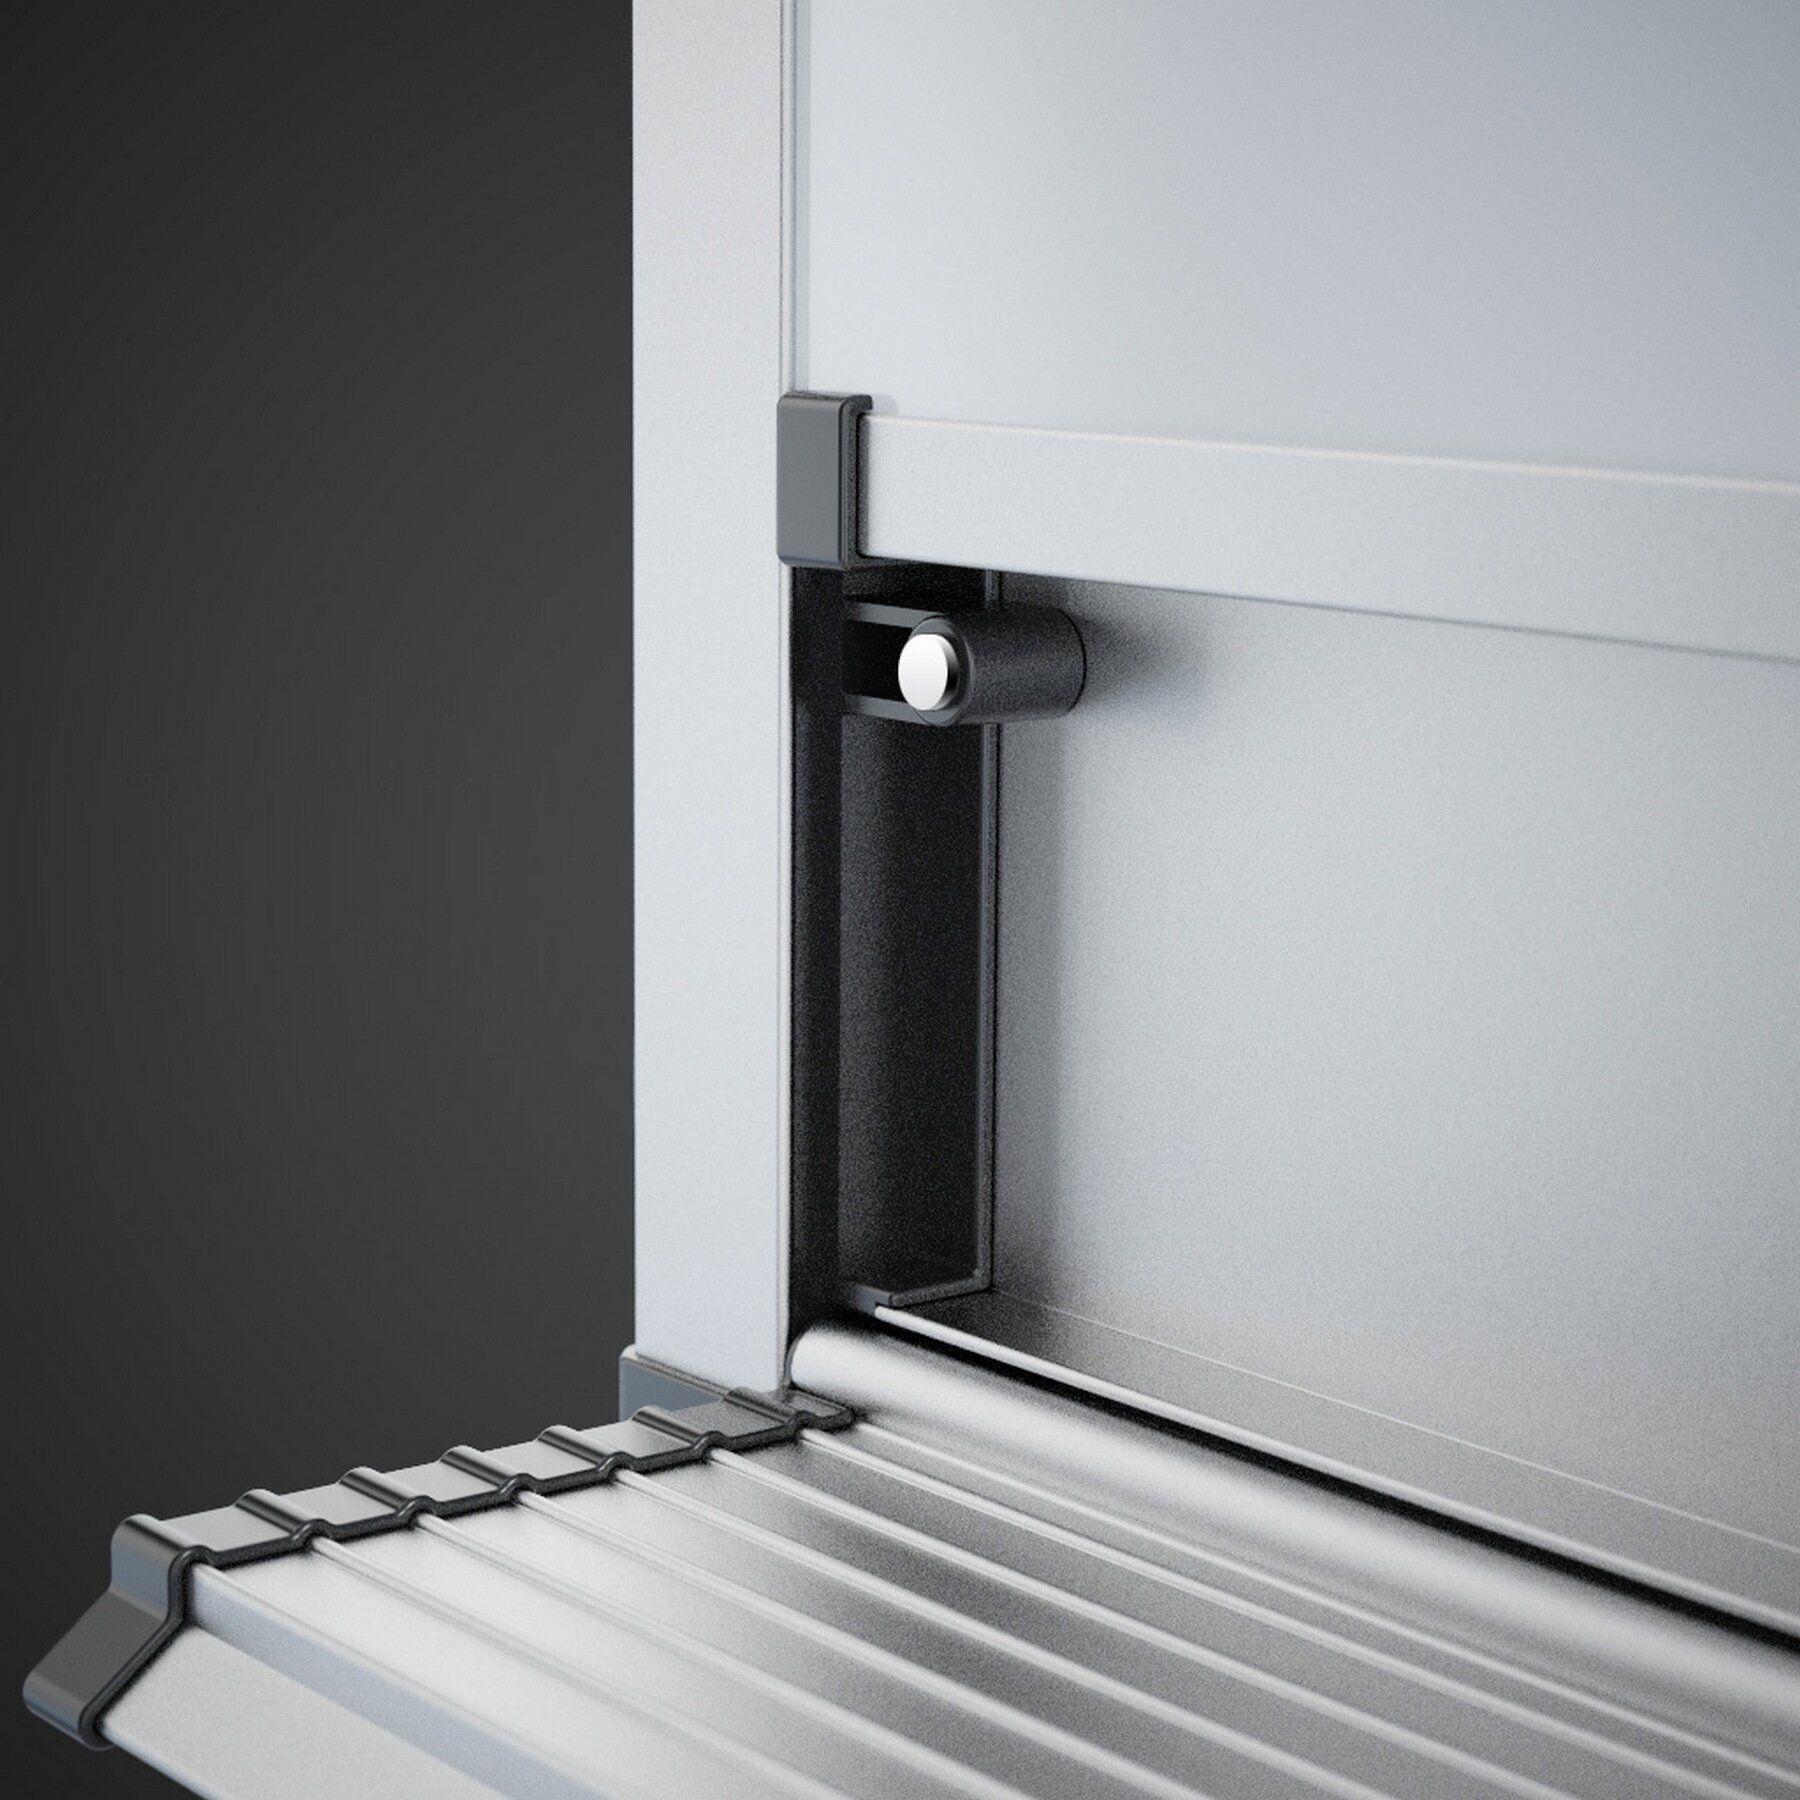 Доска белая магнитная сухостираемая StarBoard 100*150см., алюминиевая рамка, керамика 2x3 - фото 3